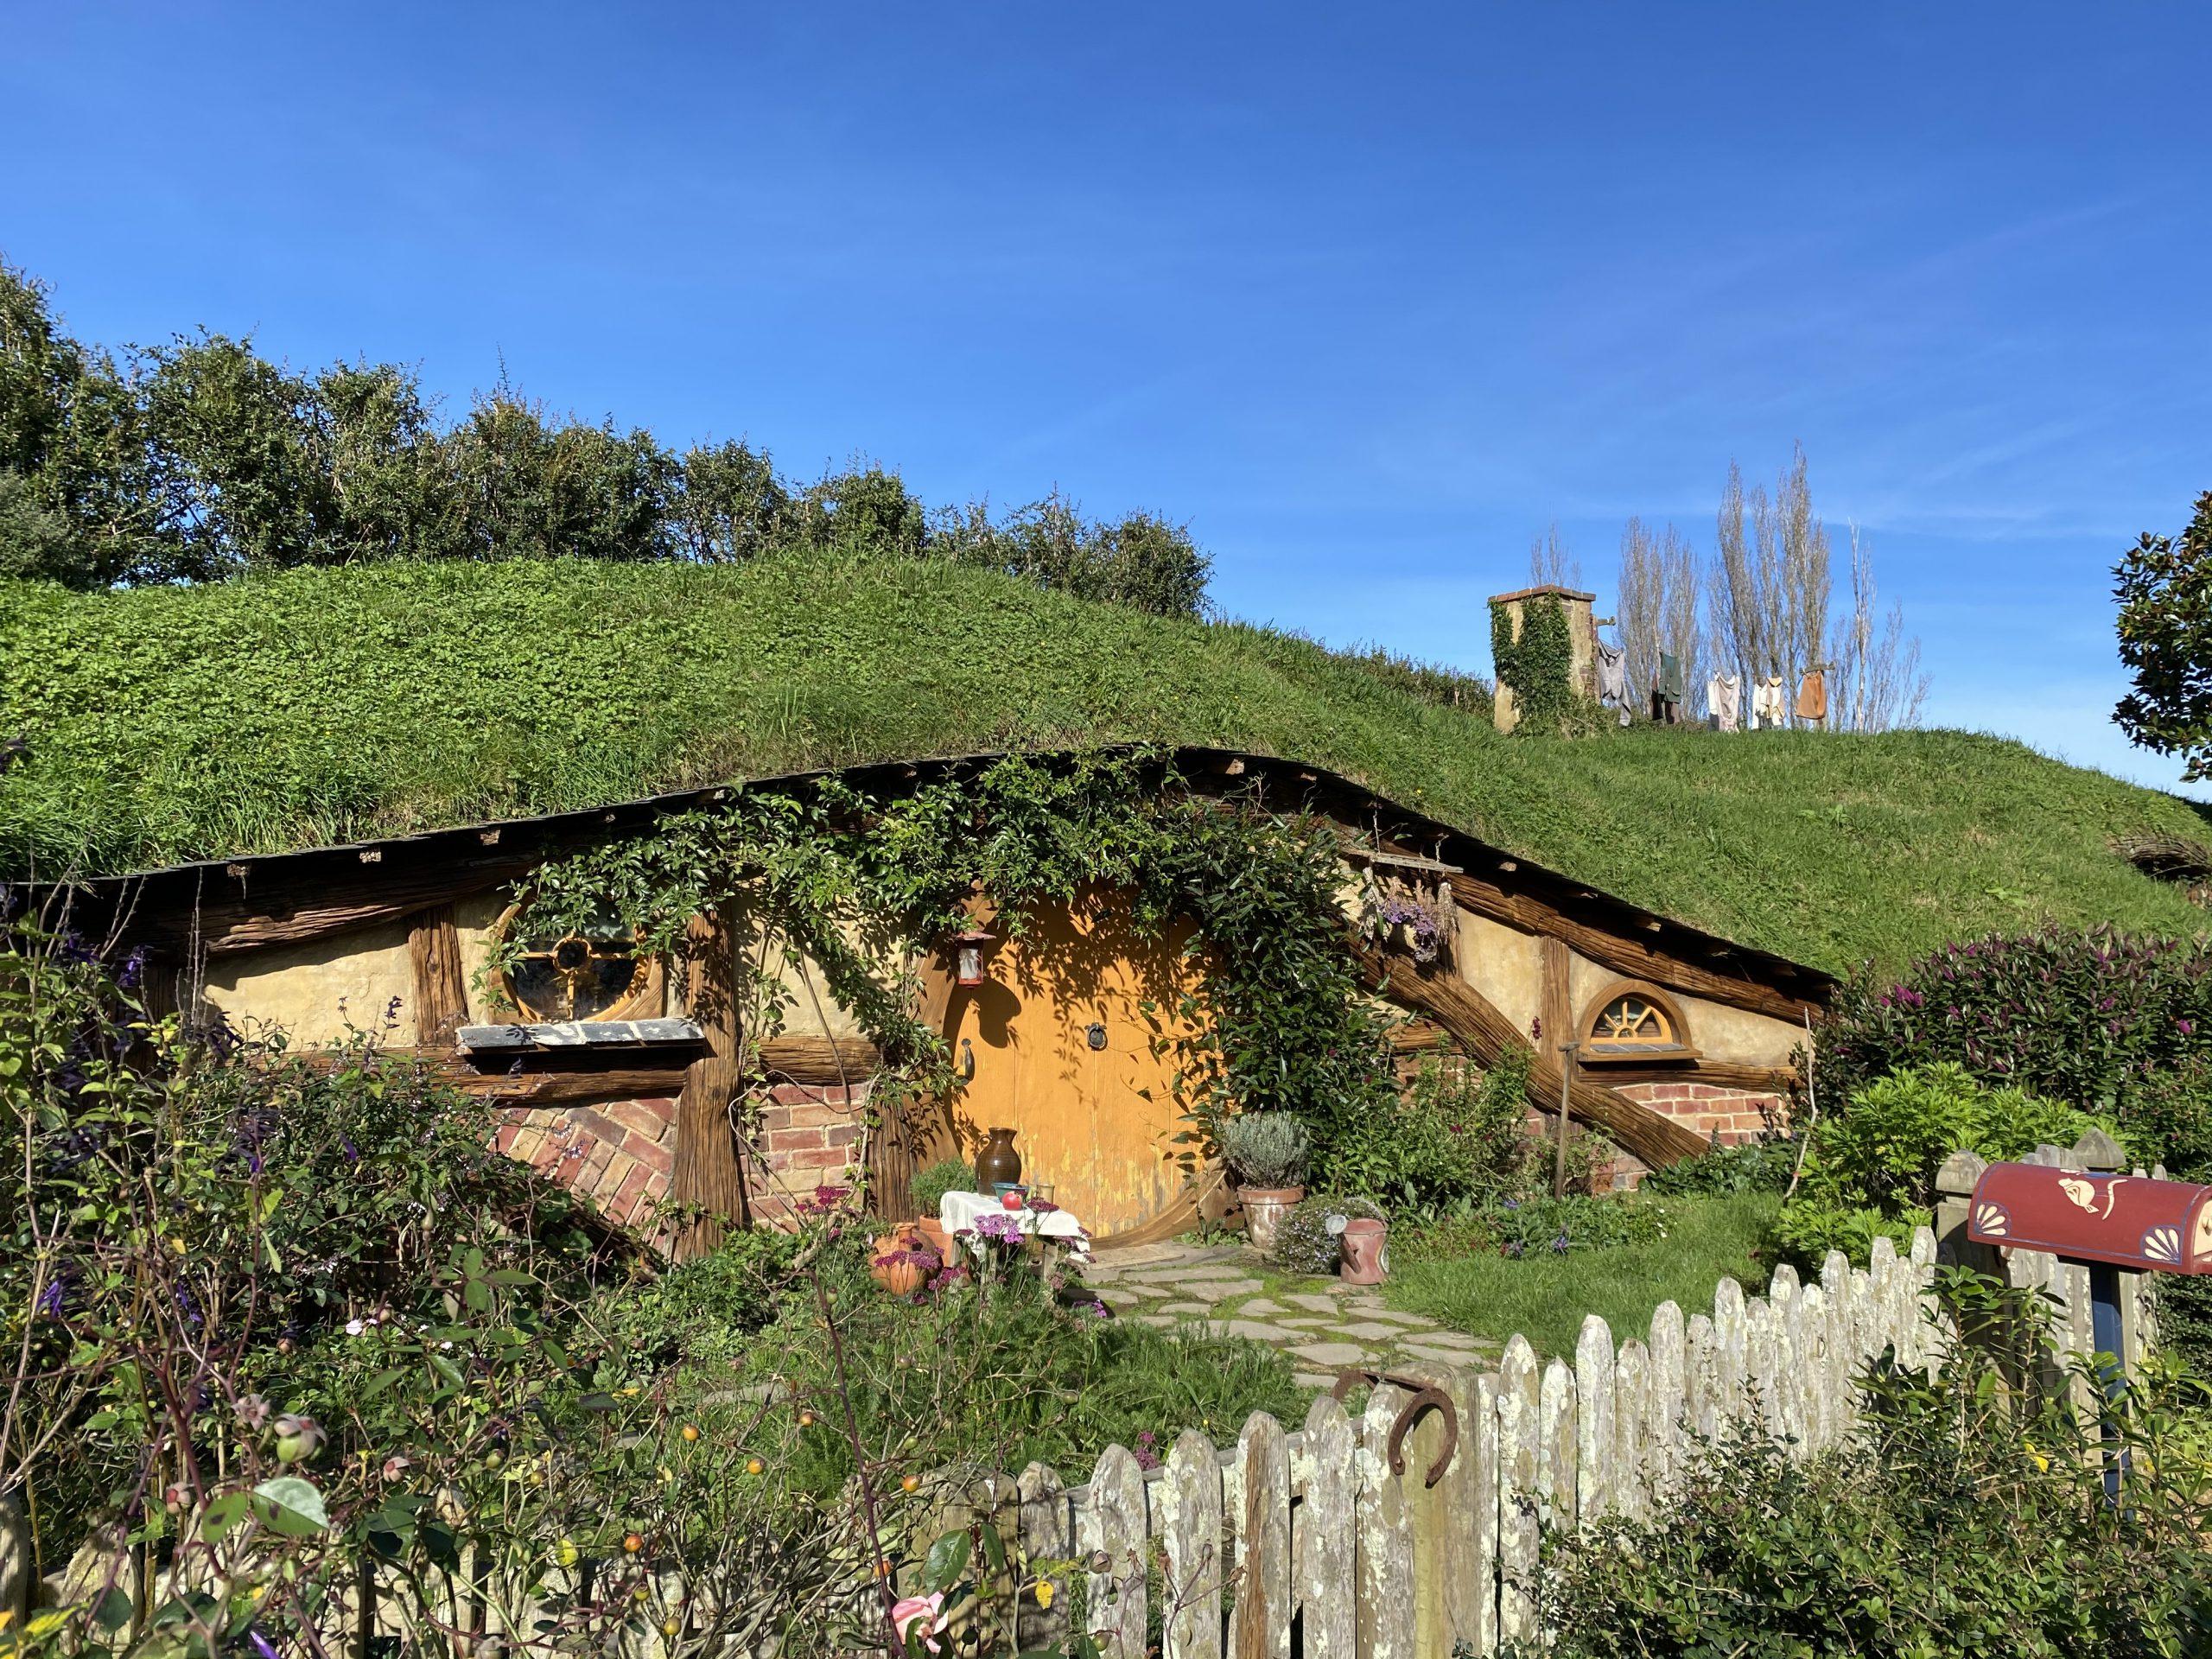 Hobbit hole with yellow door at Hobbiton Movie Set, New Zealand